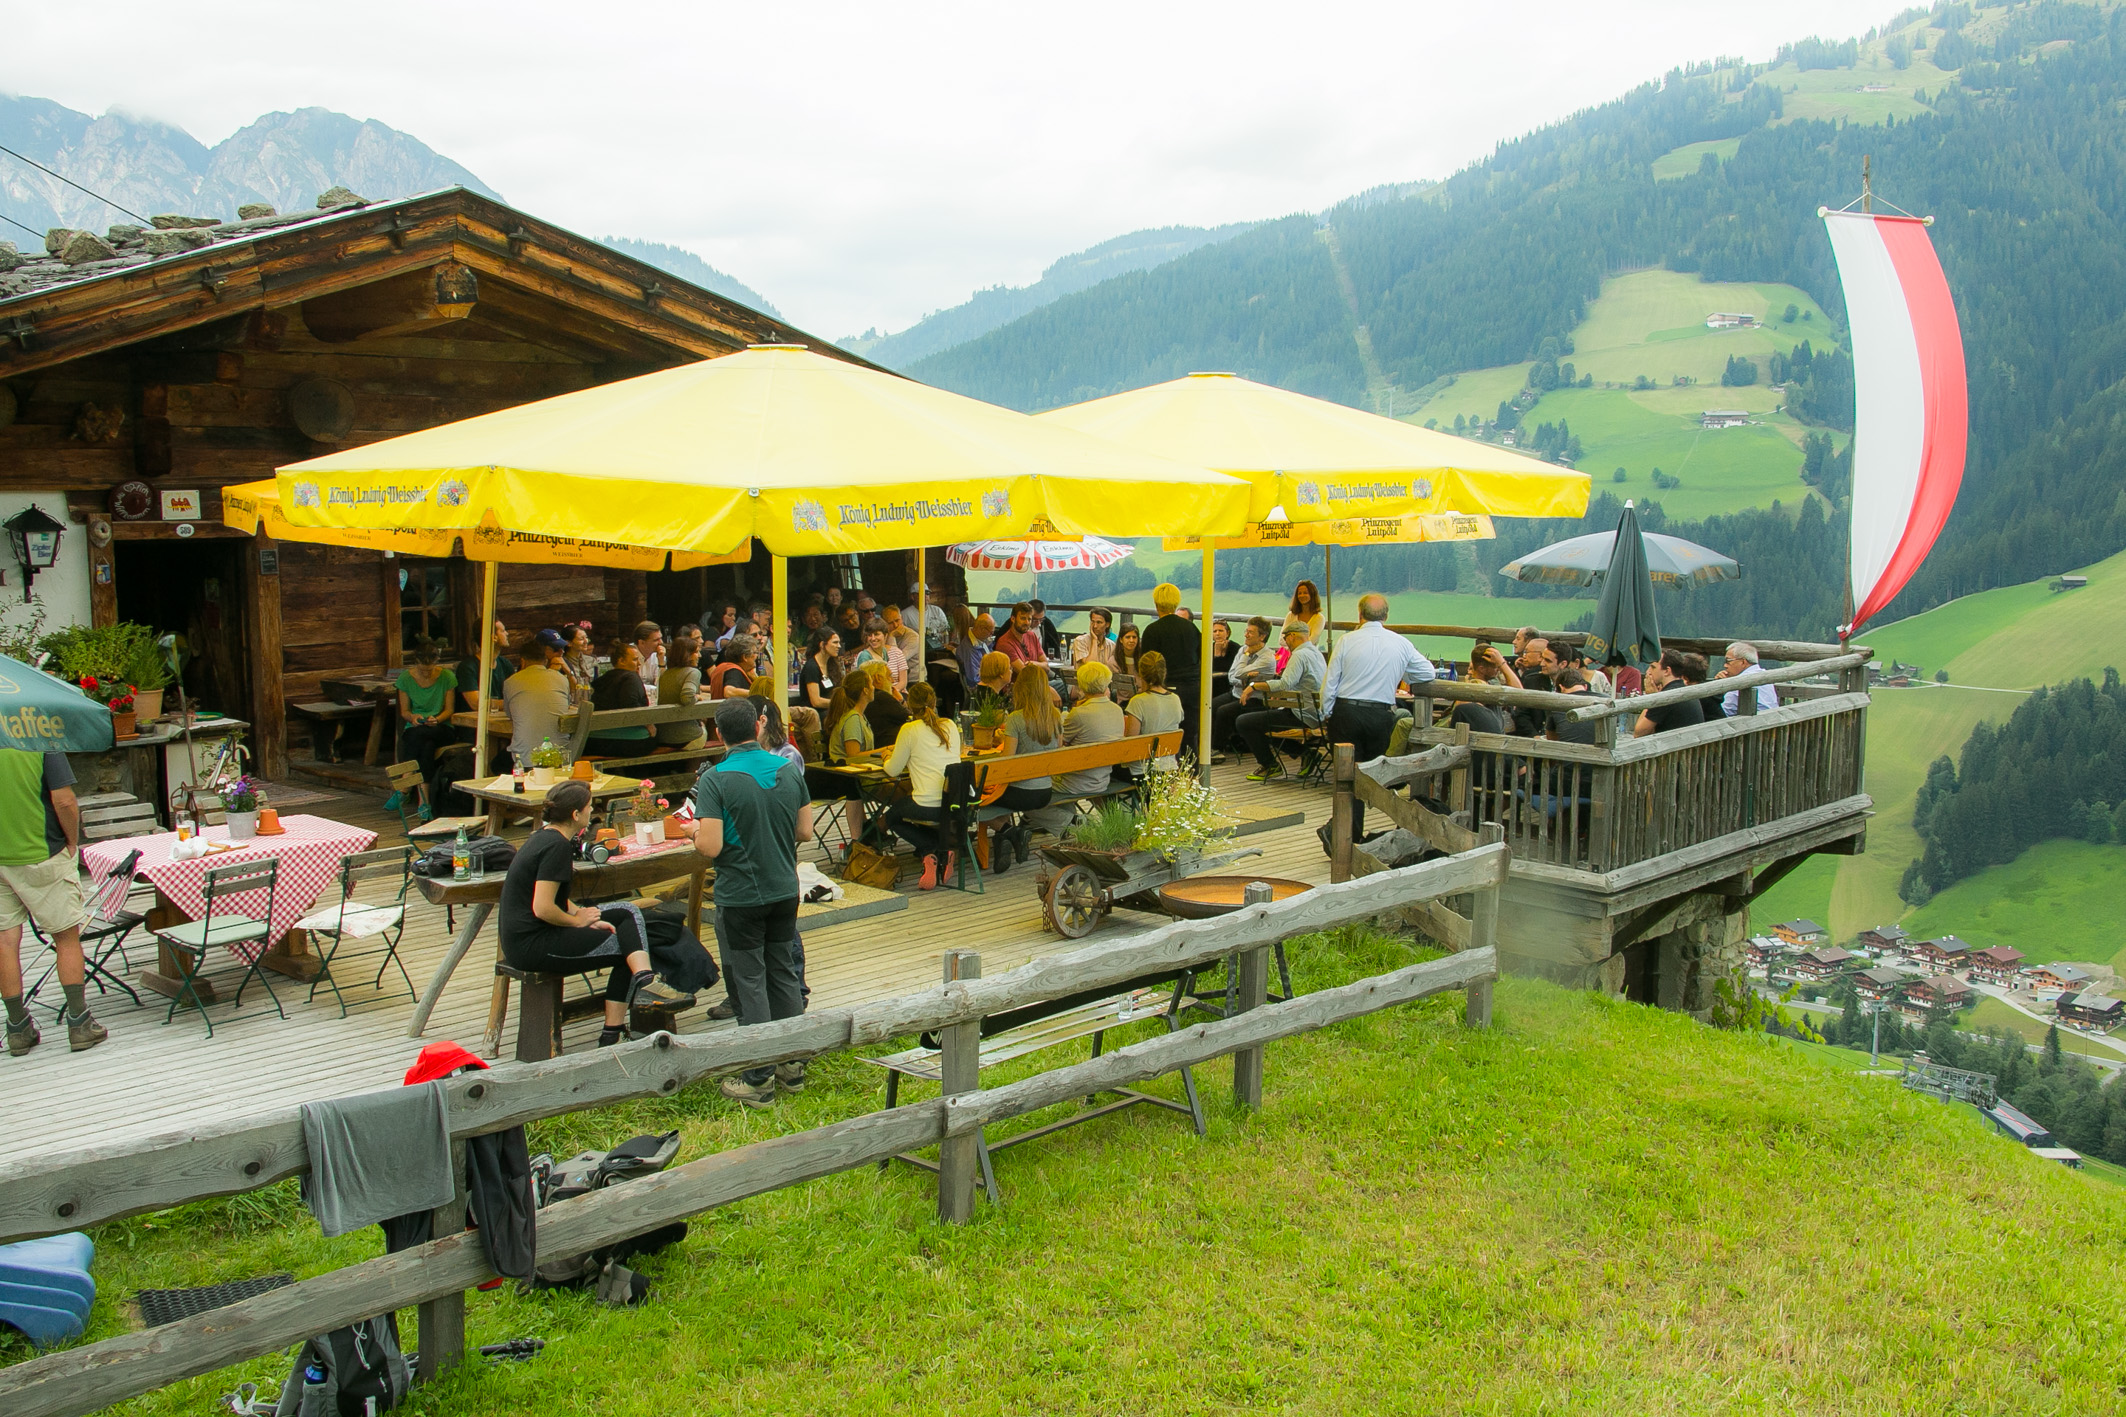 Meeting of the Alpbach-Laxenburg Group, 29 August 2016. ©Matthias Silveri | IIASA